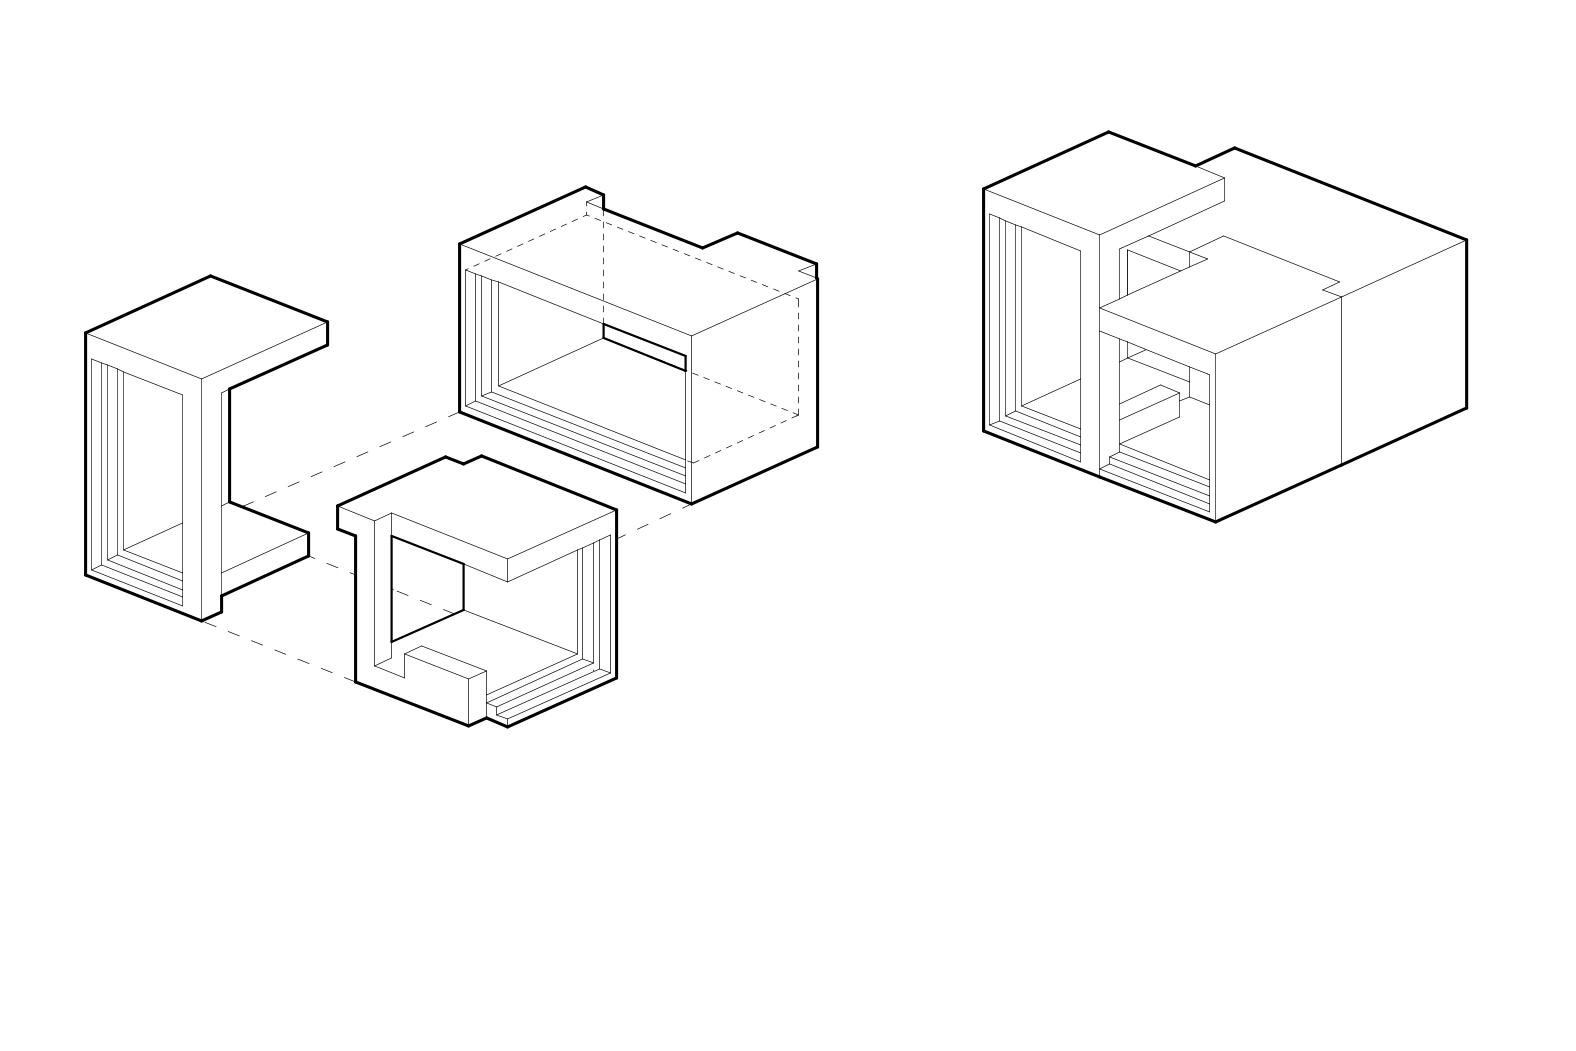 000-Diagram.jpg